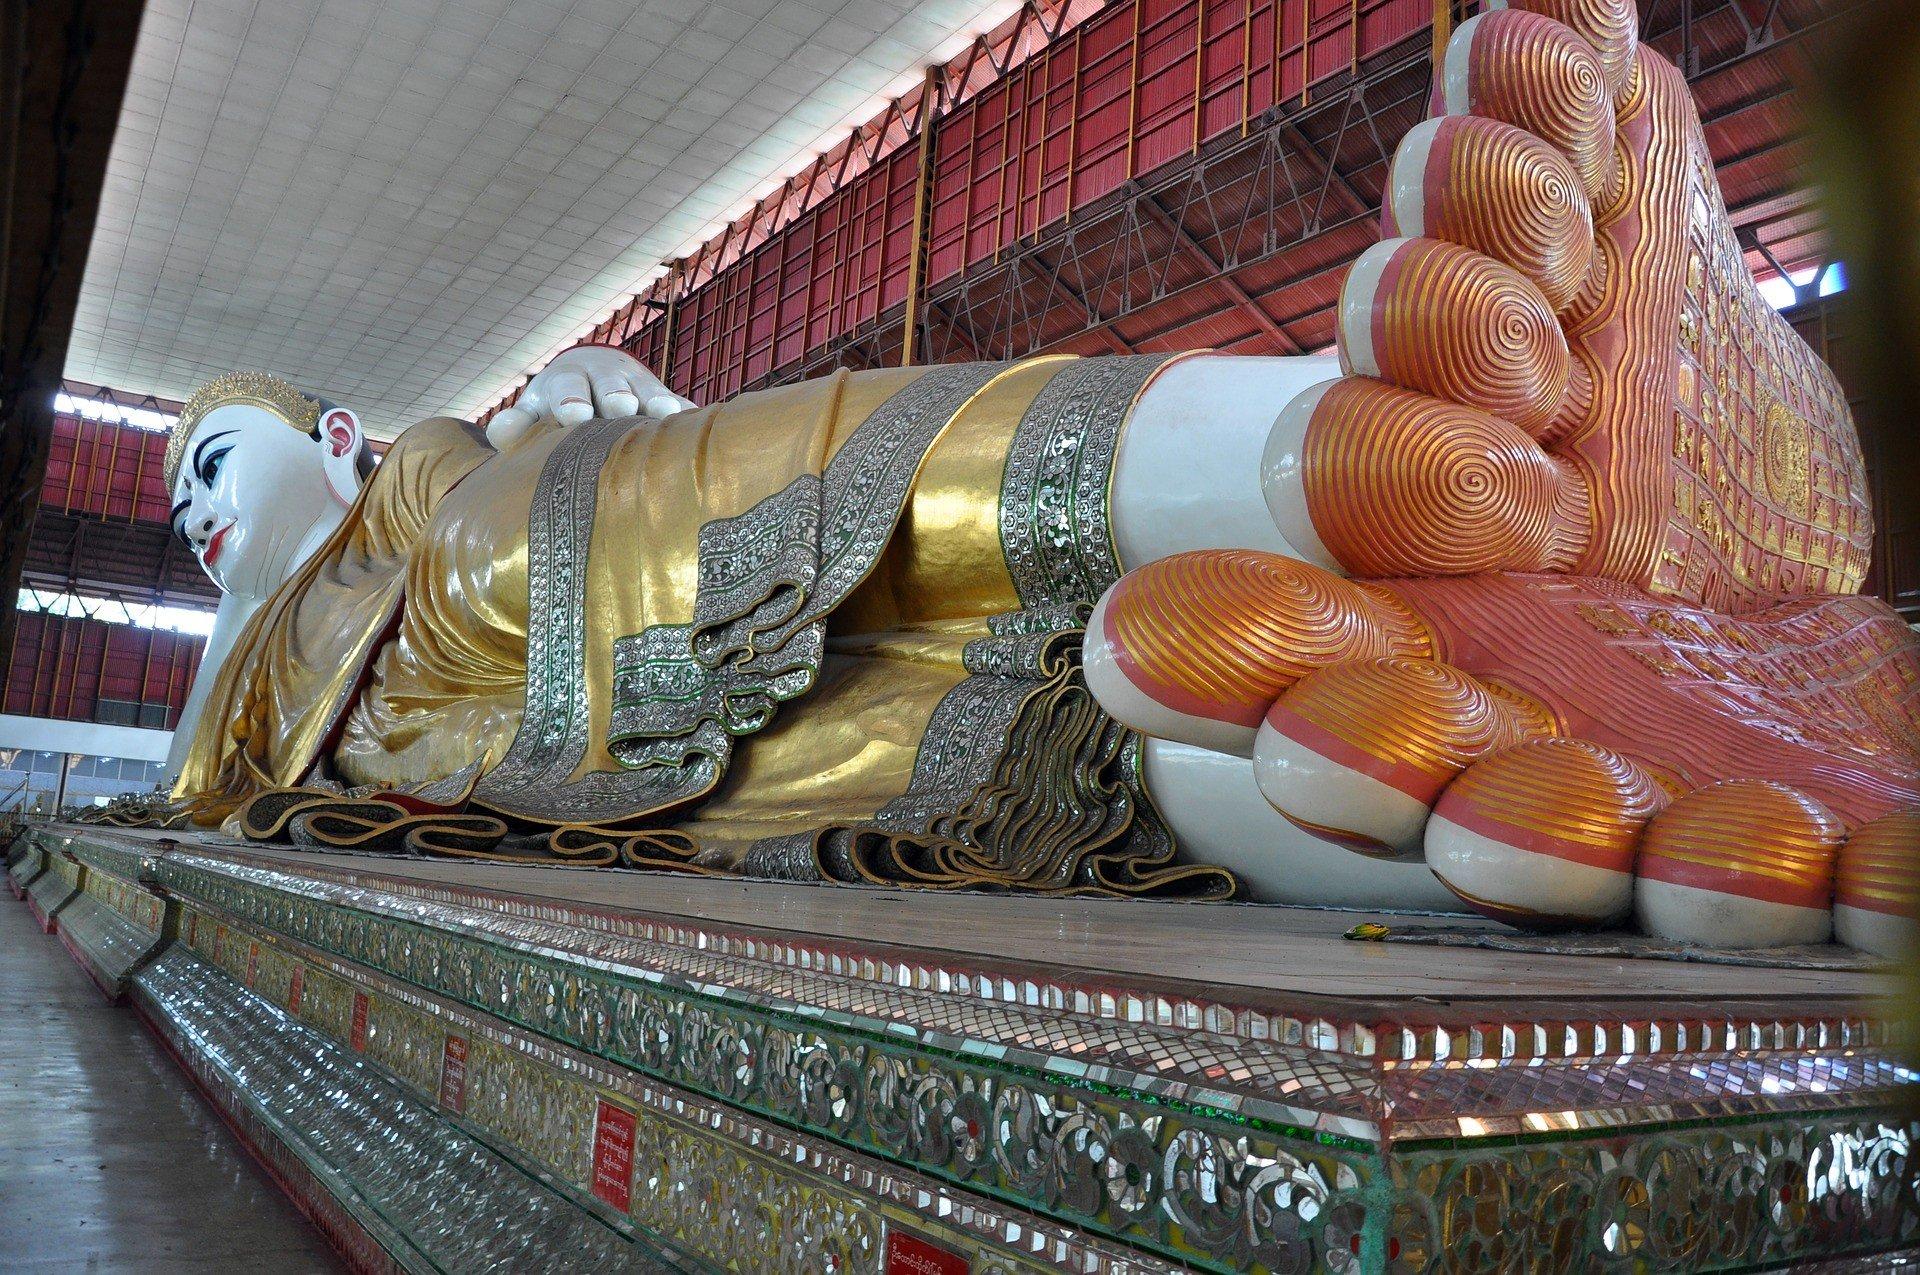 Chauk Htat Gyi Reclining Buddha in Yangon